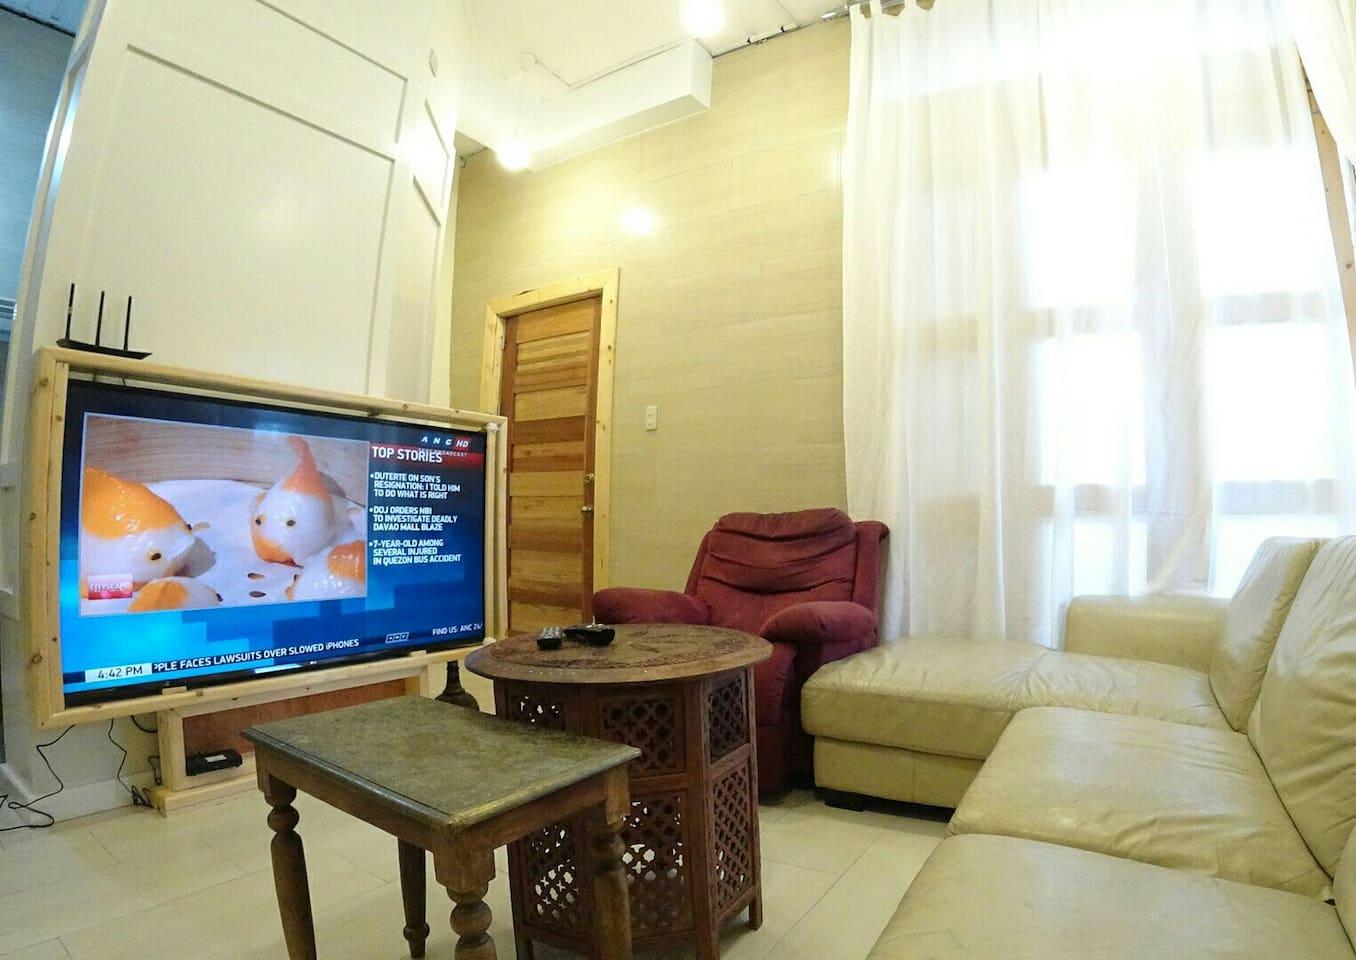 65 inches HDR TV & Fibr Internet PLDT